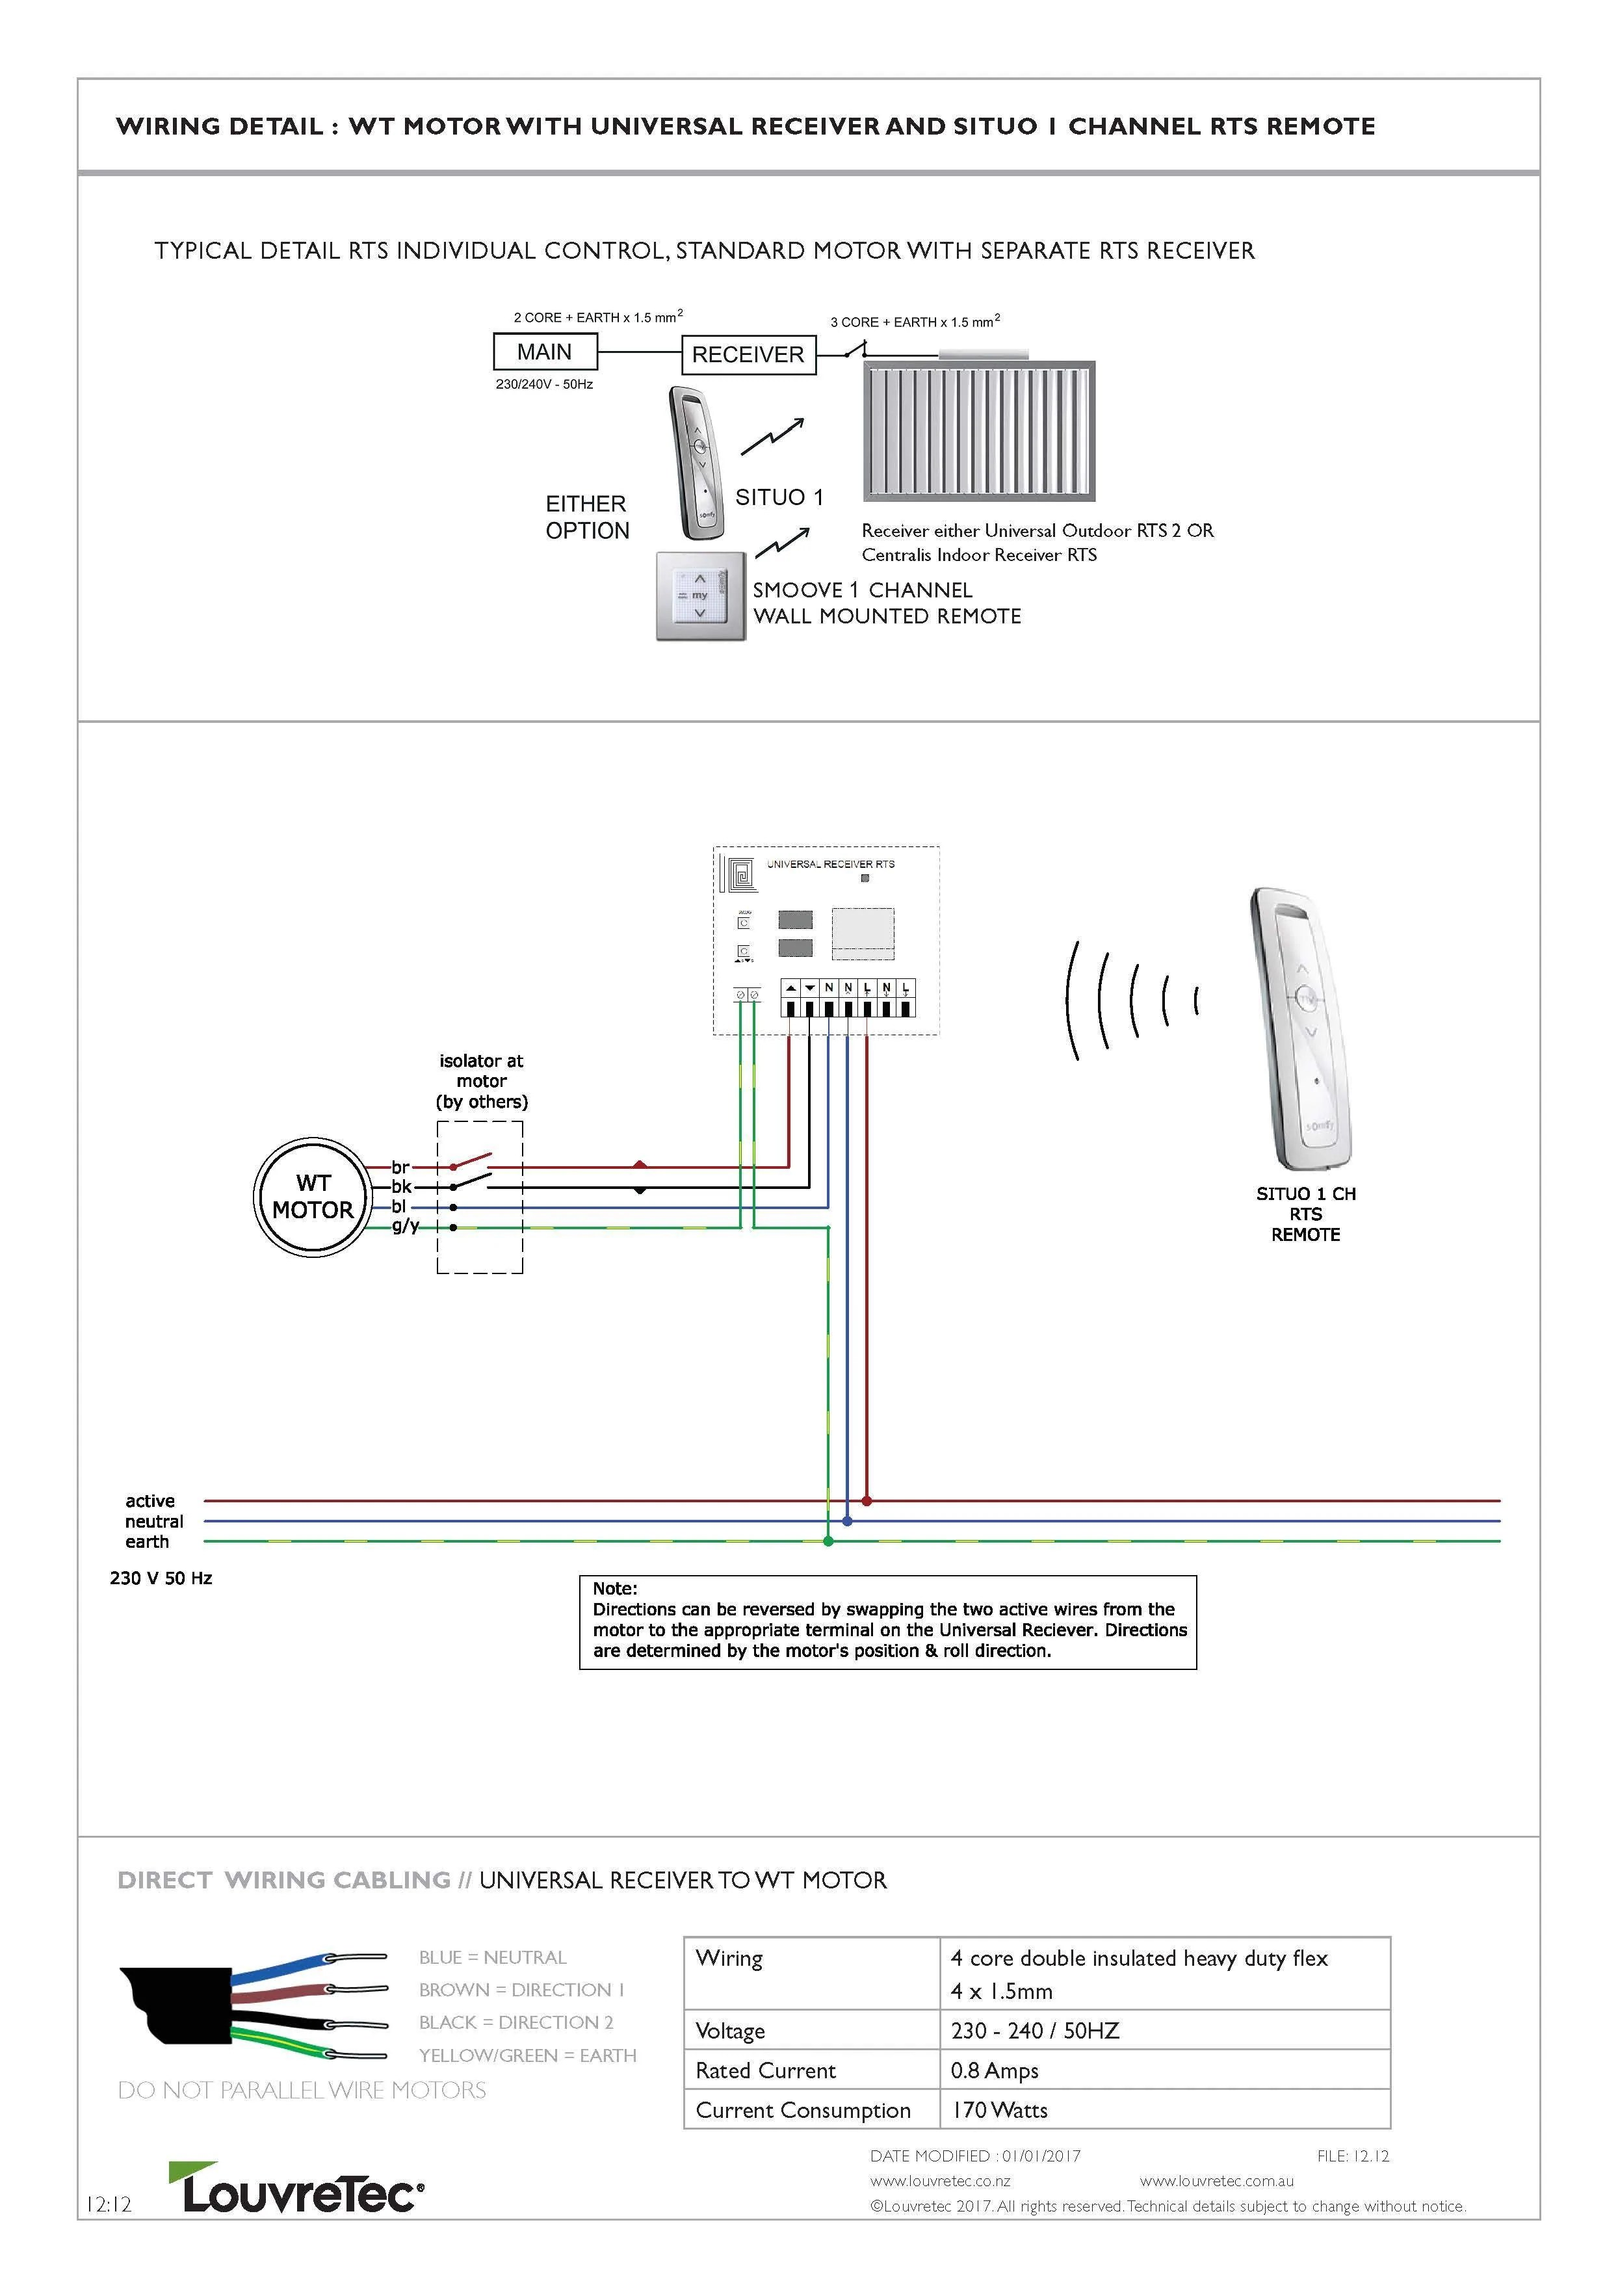 hight resolution of rts motor wiring diagram wiring diagram reviewtechnical wiring diagrams louvretec australia rts individual control w rts